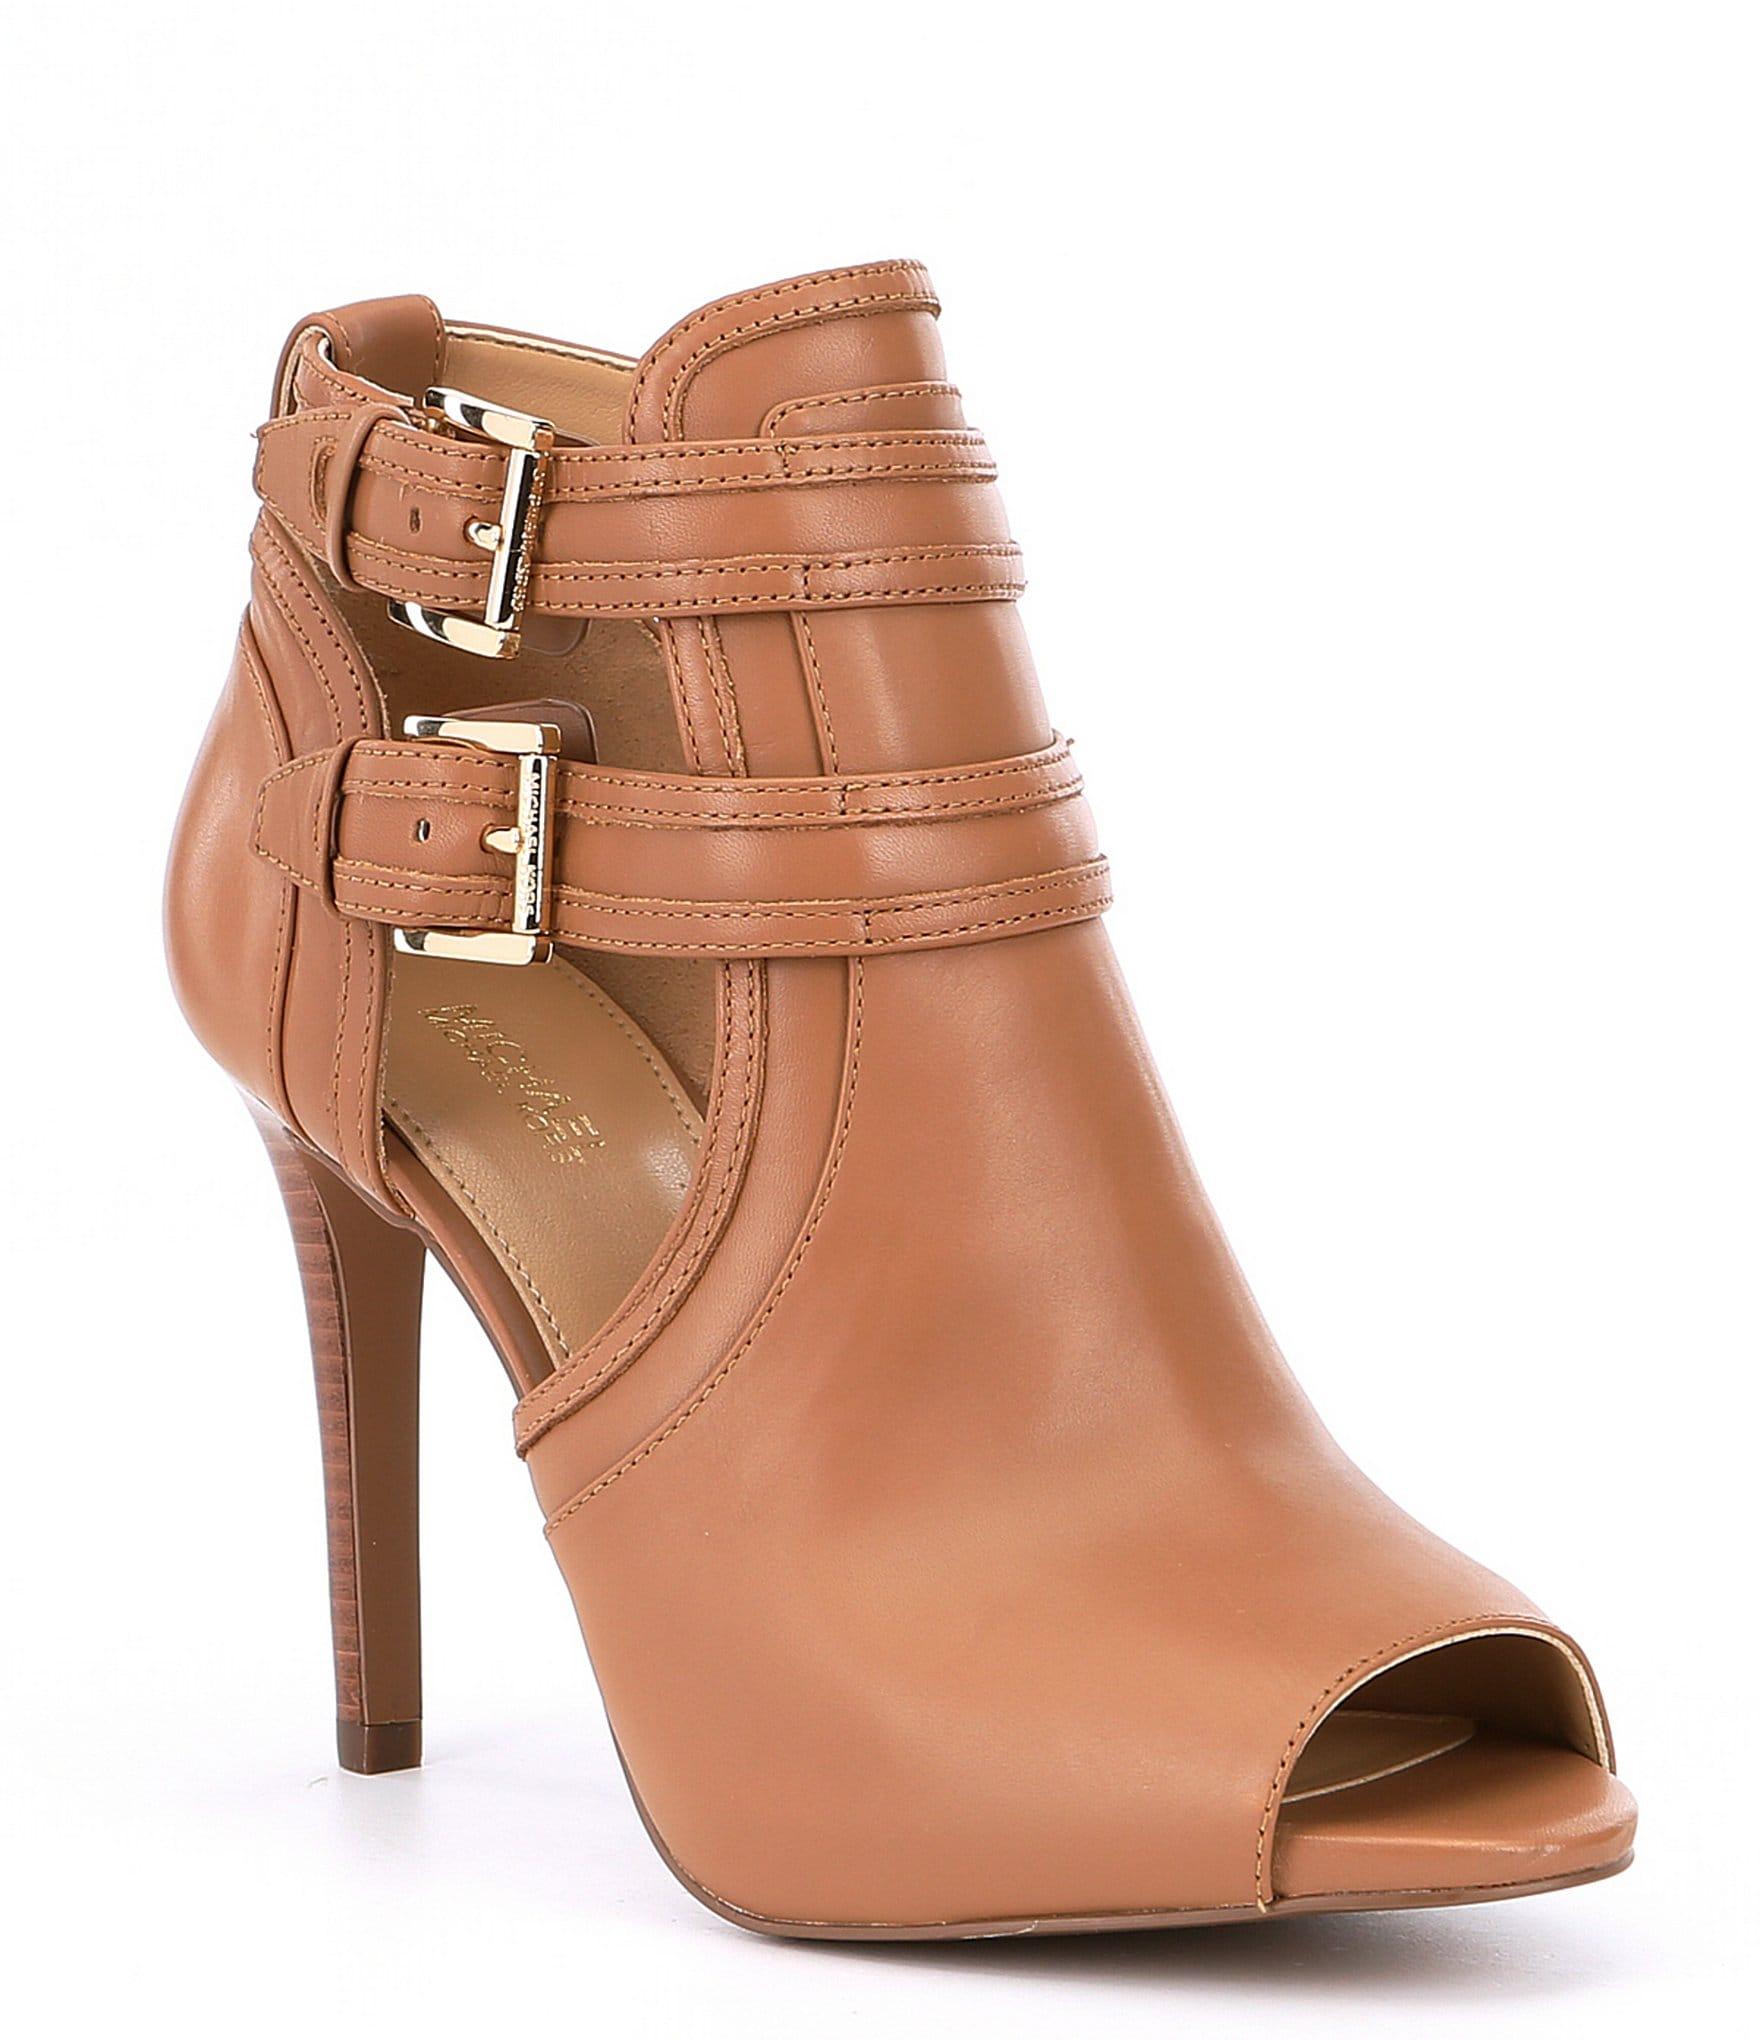 796091a19e54 Buy michael kors heel sandals > OFF79% Discounted